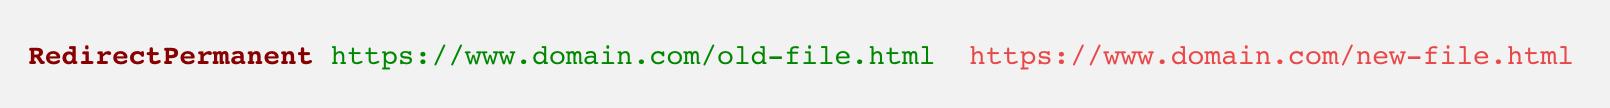 RedirectPermanent https://www.domain.com/old-file.html https://www.domain.com/new-file.html